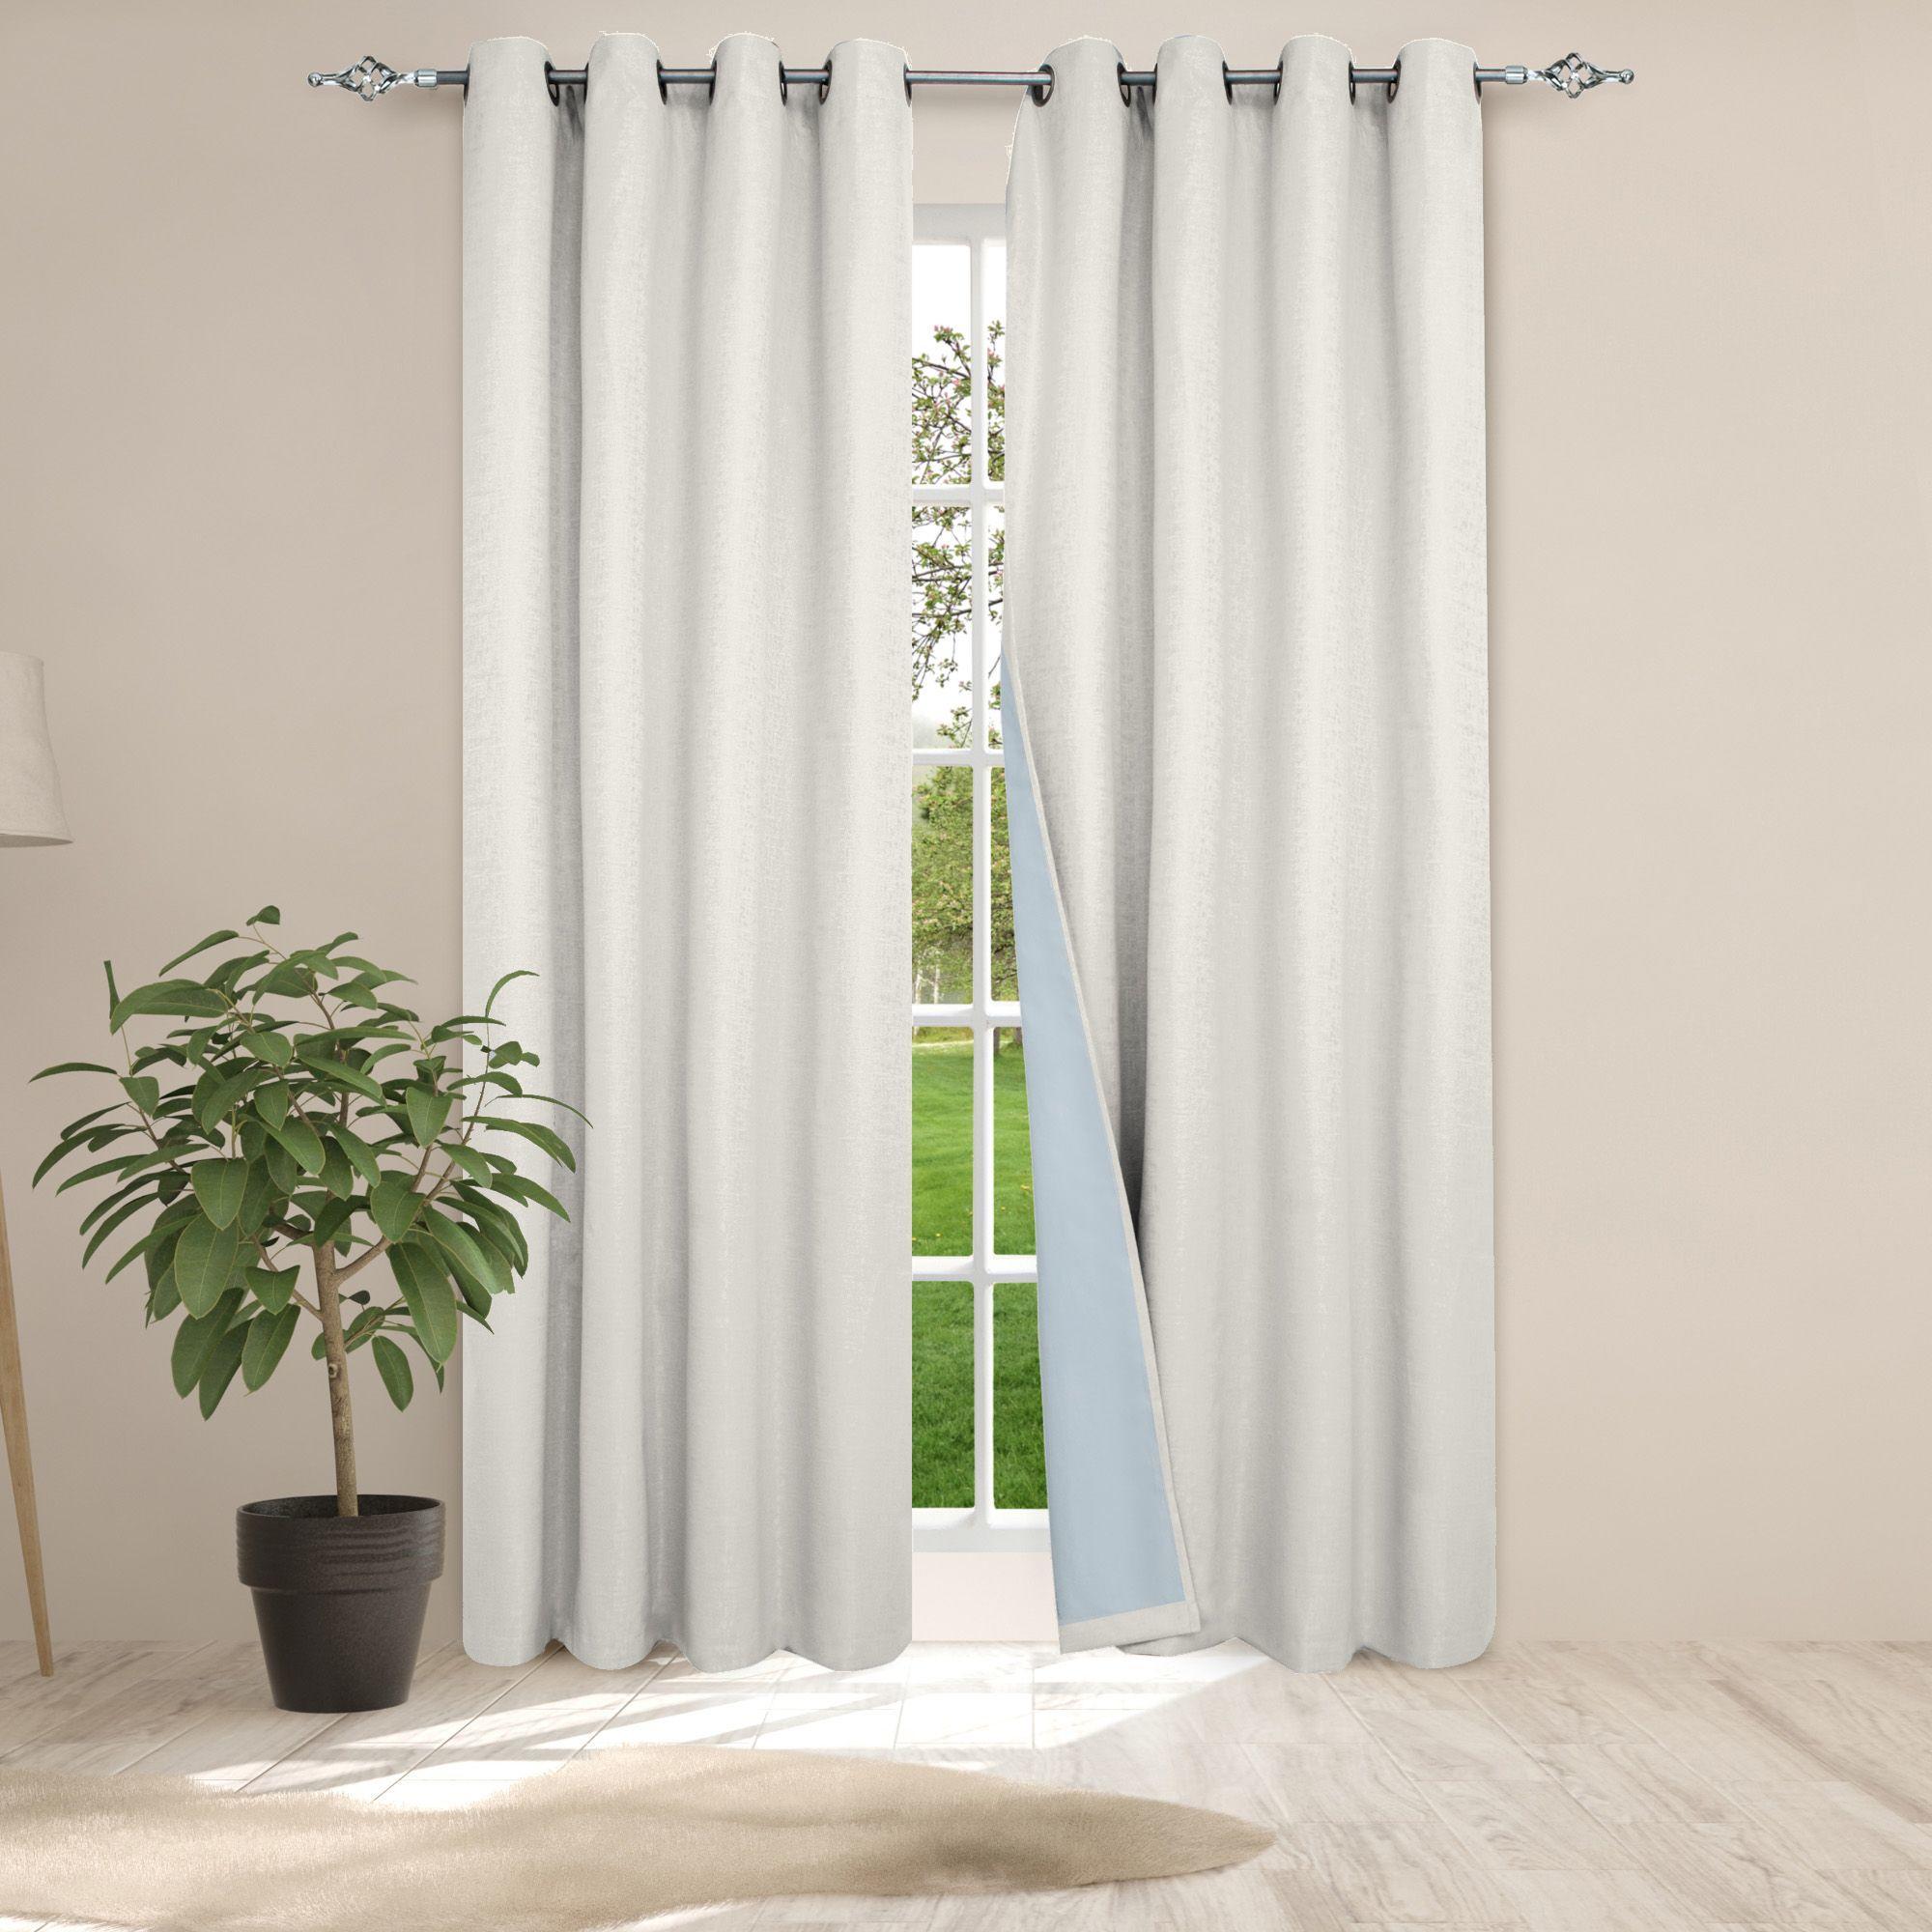 Dd407 safdie co lvth 51325zec2z01 white curtains woven jacquard curtain w tpu panel 84l ultimate blackout white